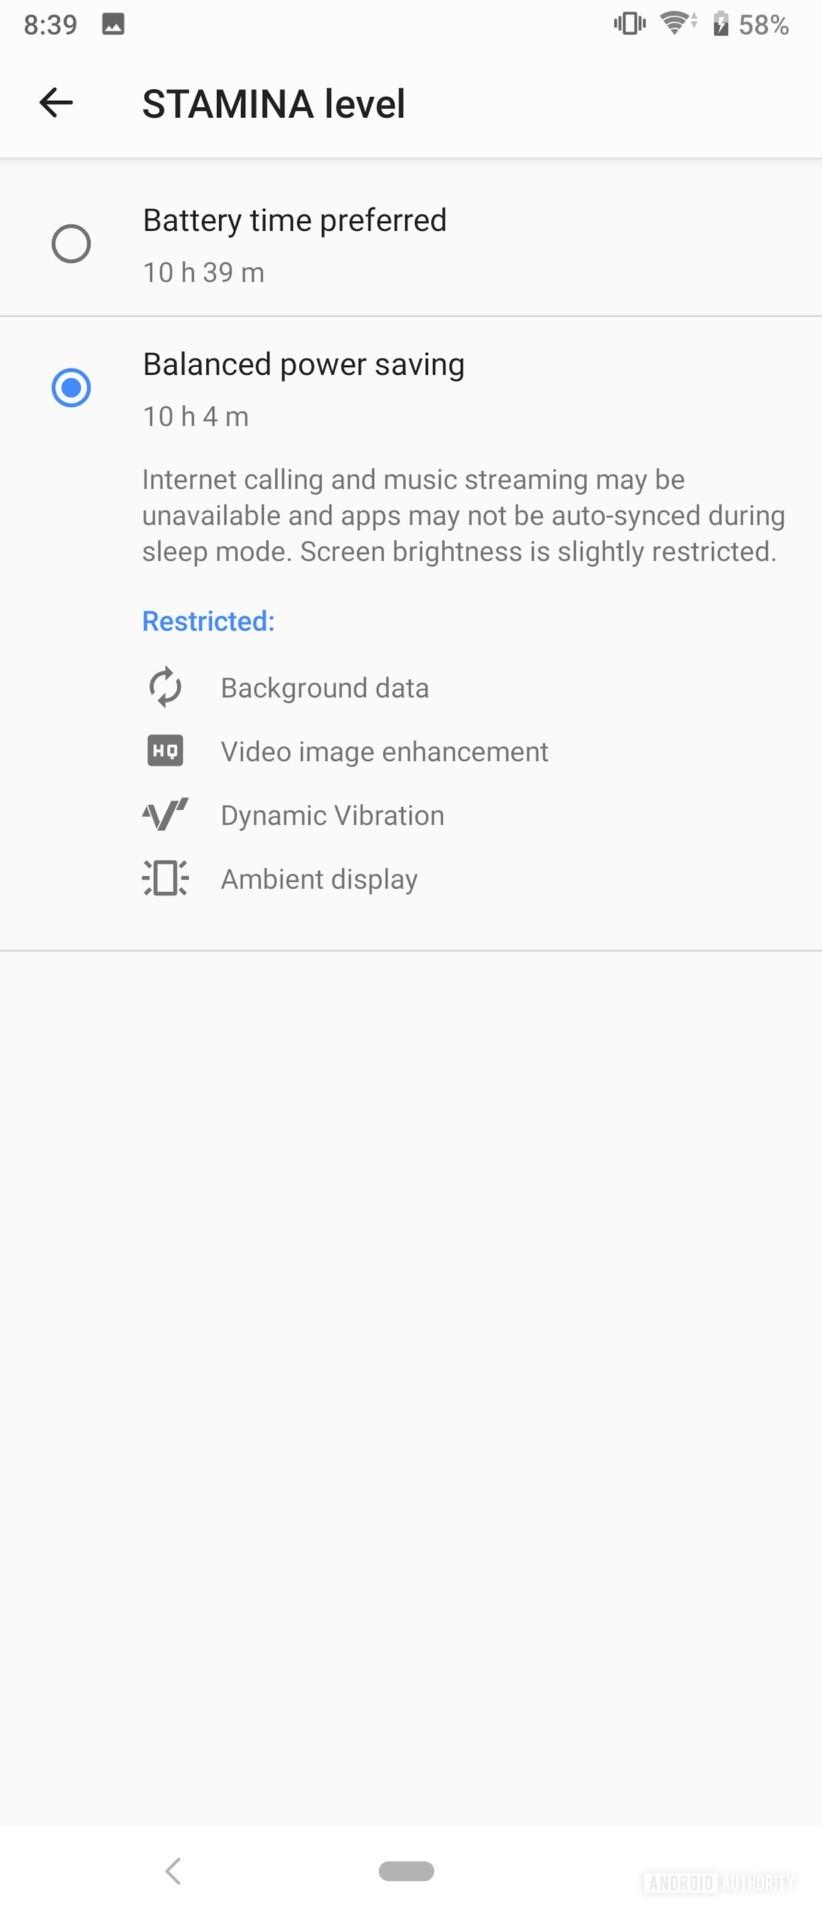 Sony Xperia 1 Review Stamina level